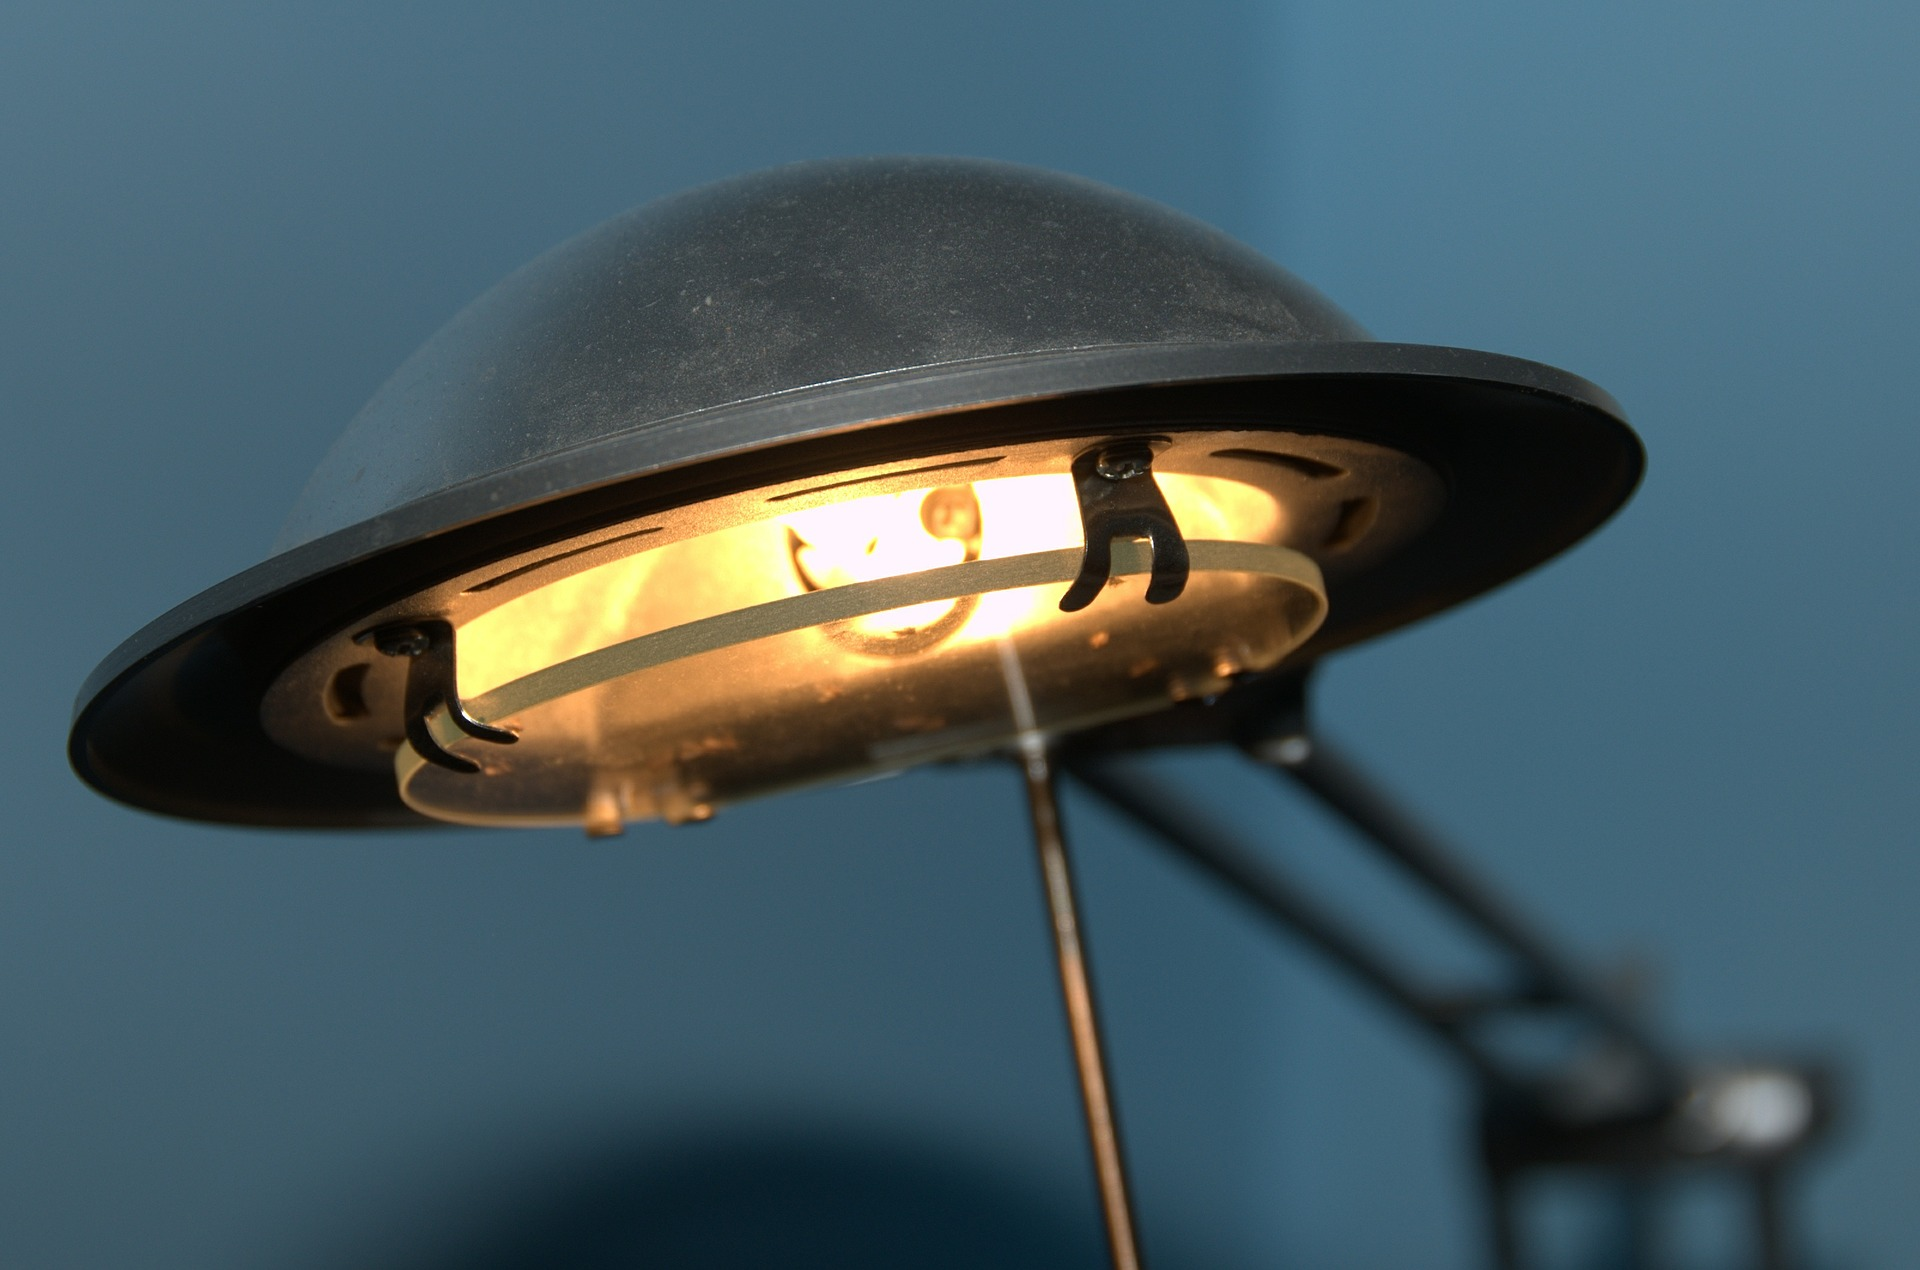 desk-lamp-494329_1920